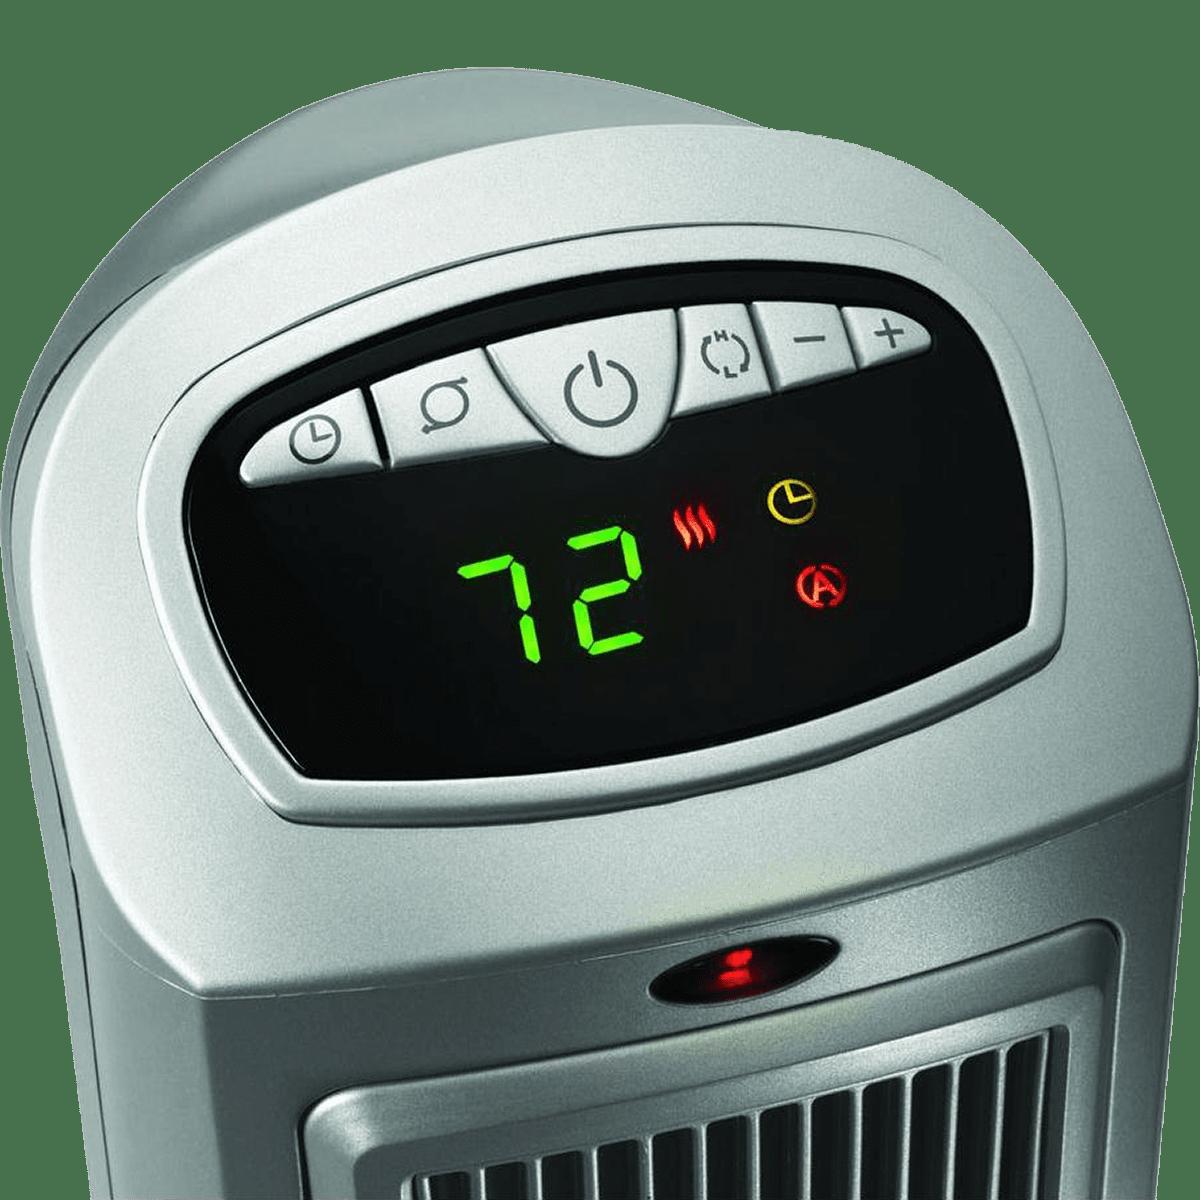 Lasko Digital Ceramic Tower Heater With Remote Control